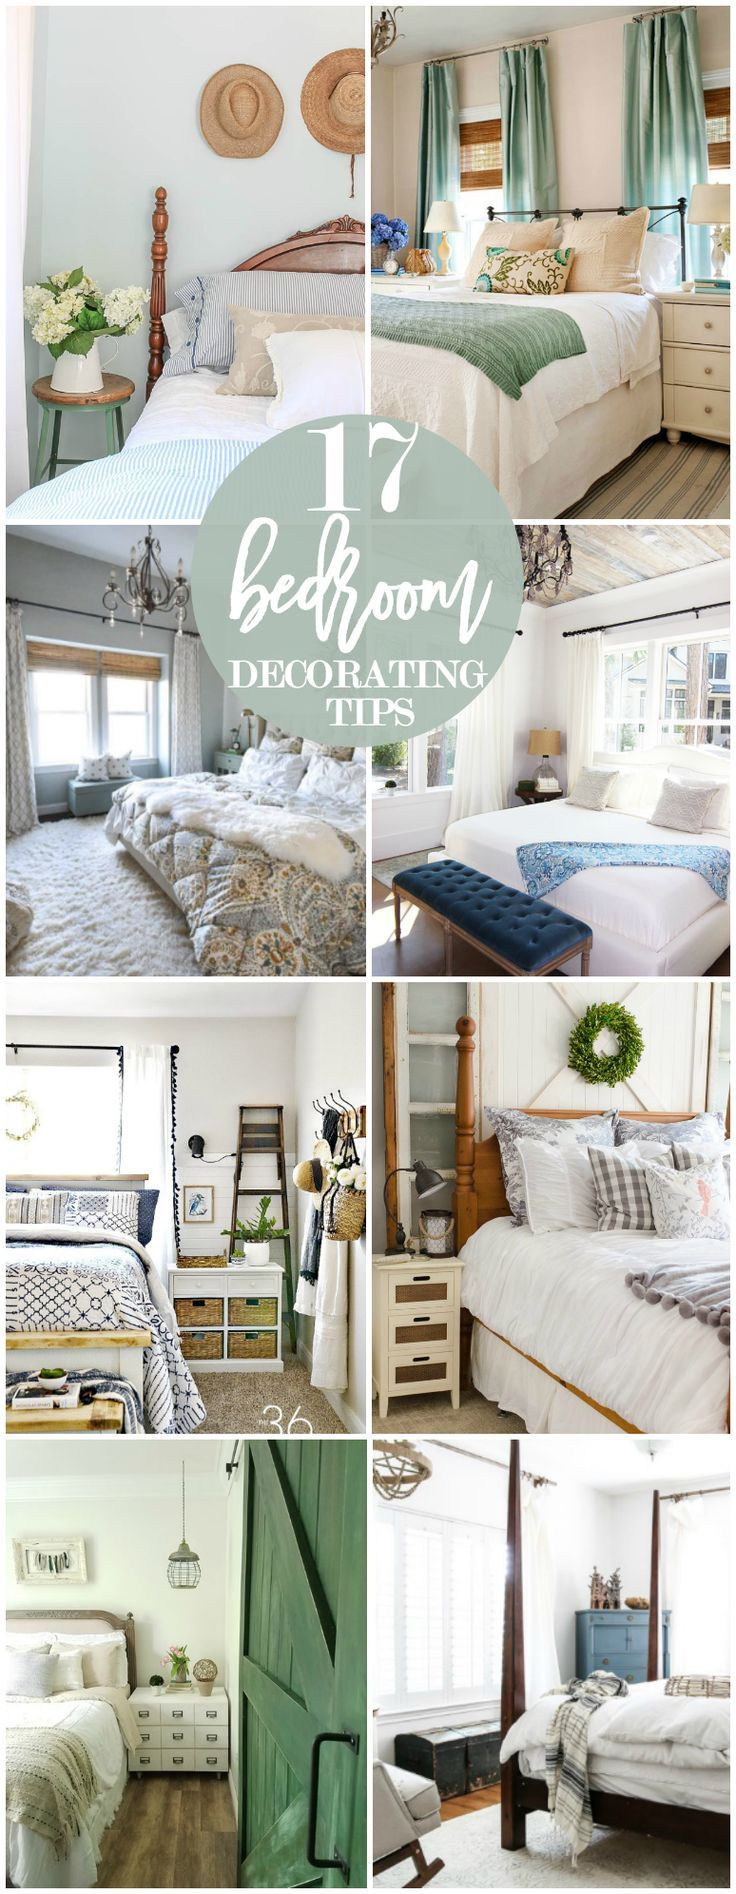 Bedroom Design Ideas Cheap Bedroom Decorating Ideas Bedroom Decor Bedroom Tips The Best Of